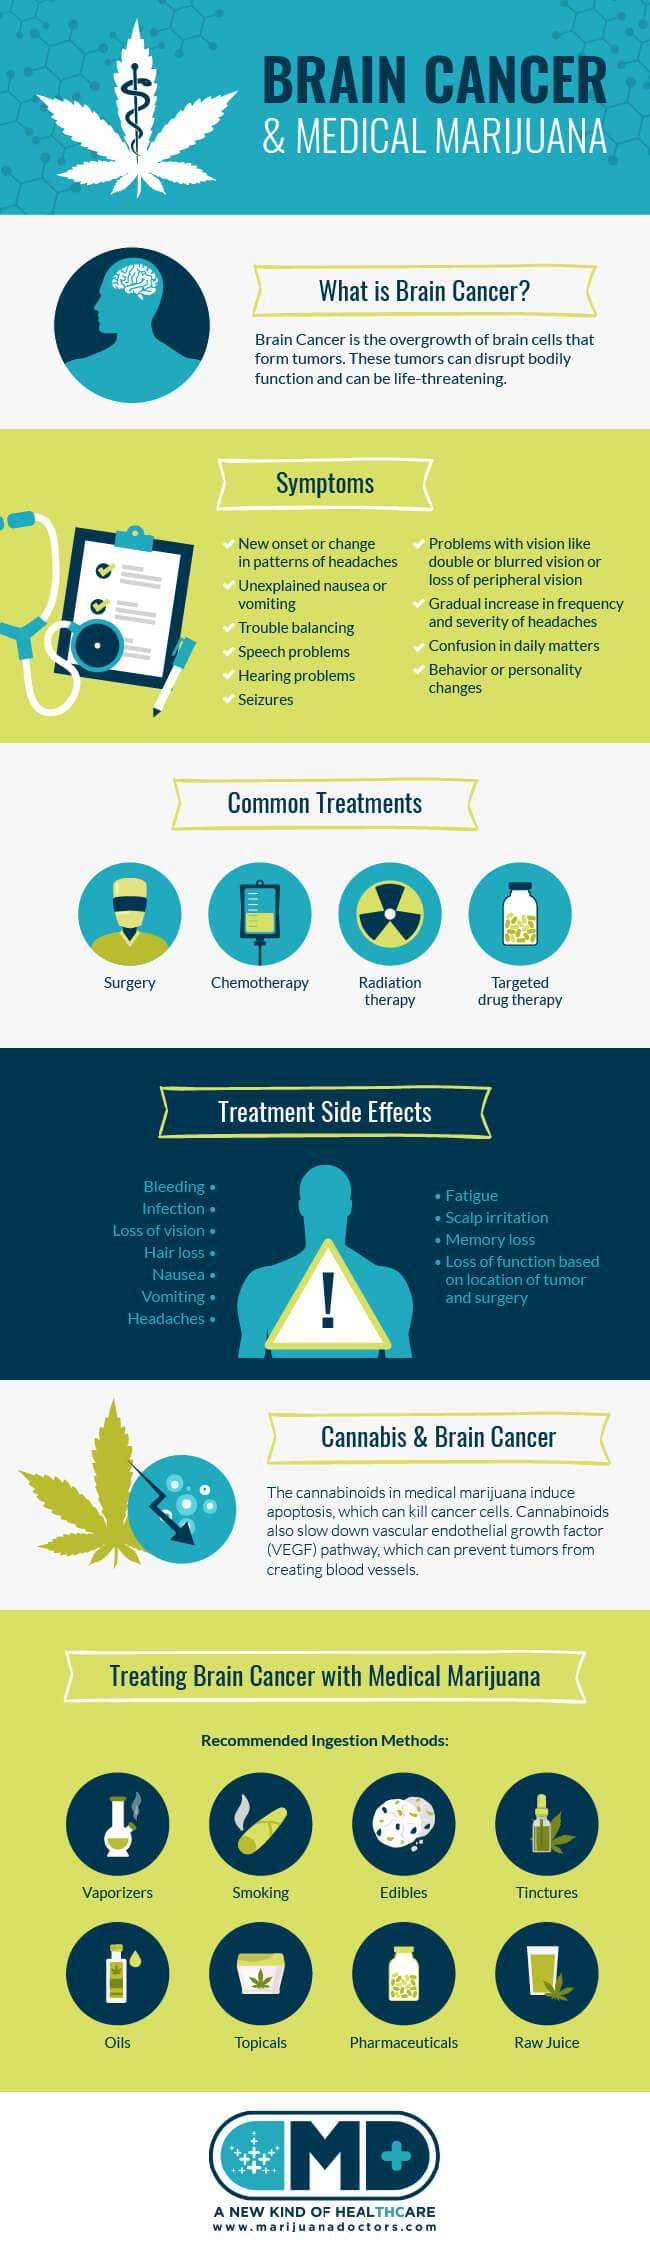 Medical Marijuana & Brain Cancer